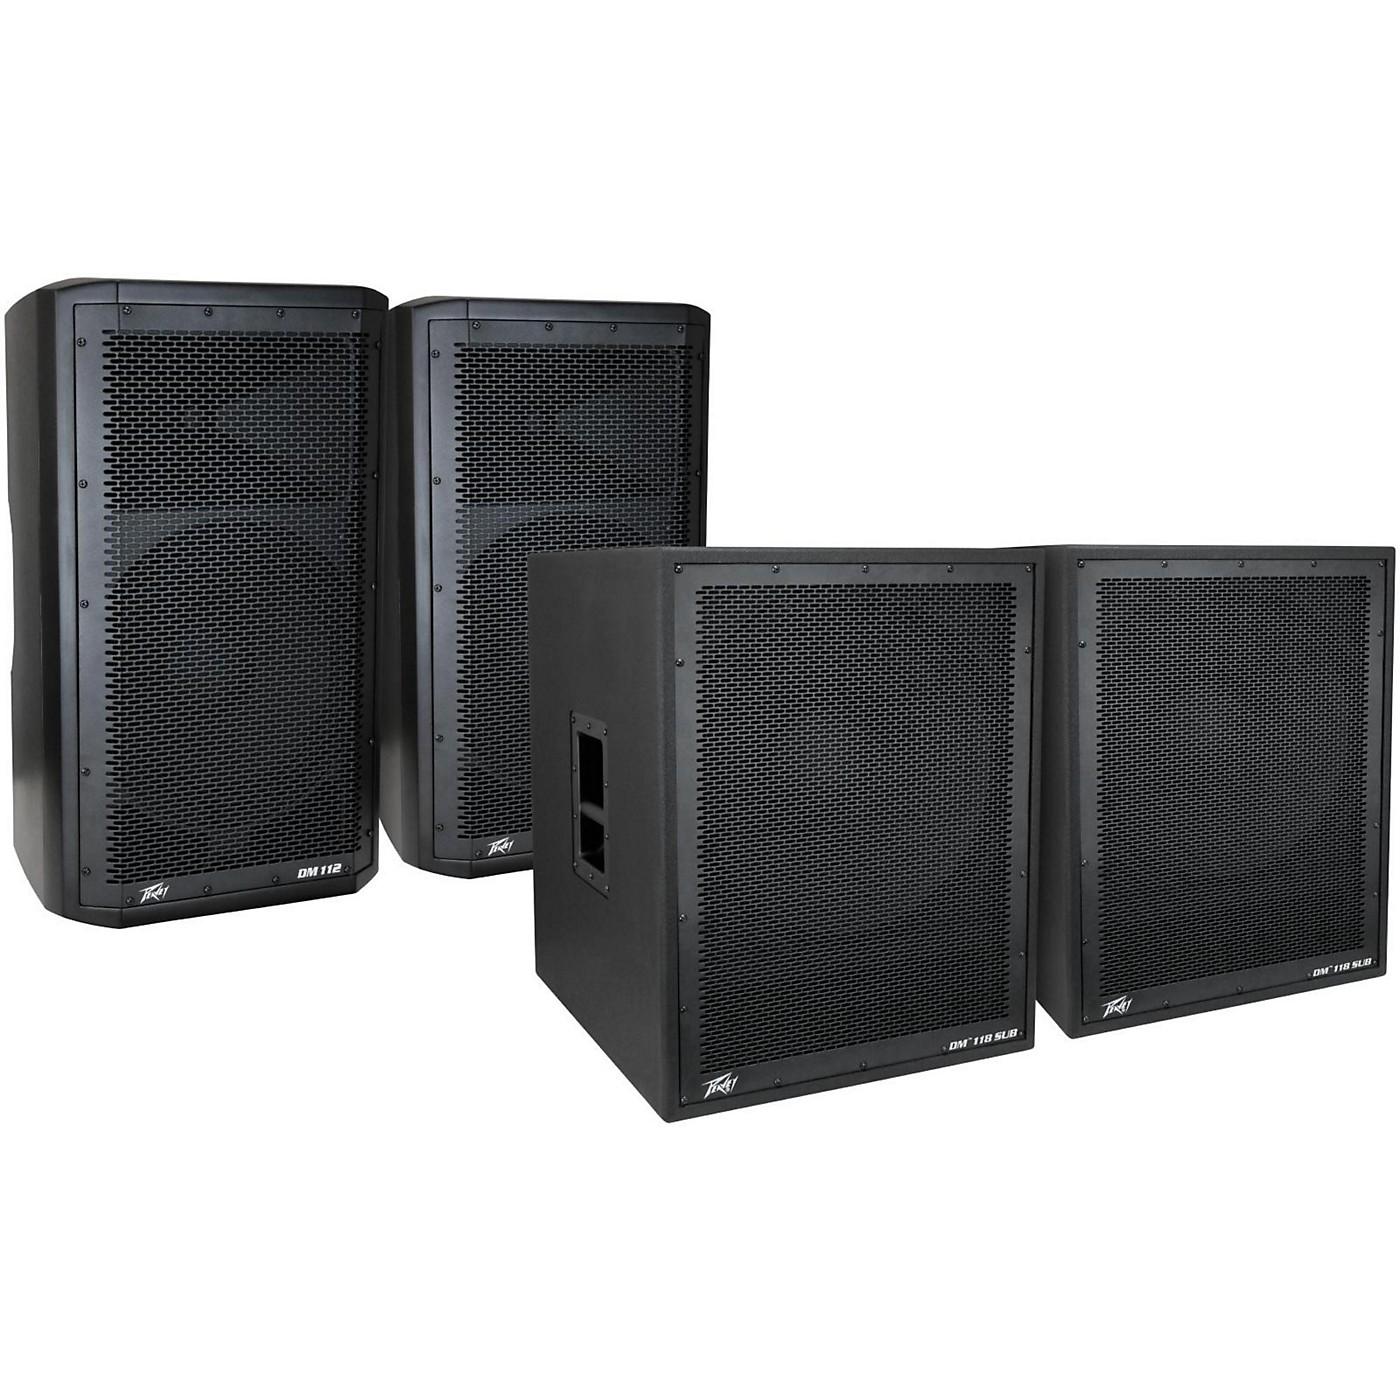 Peavey Dark Matter DM 112 Powered Speaker and DM118 Sub Pair thumbnail